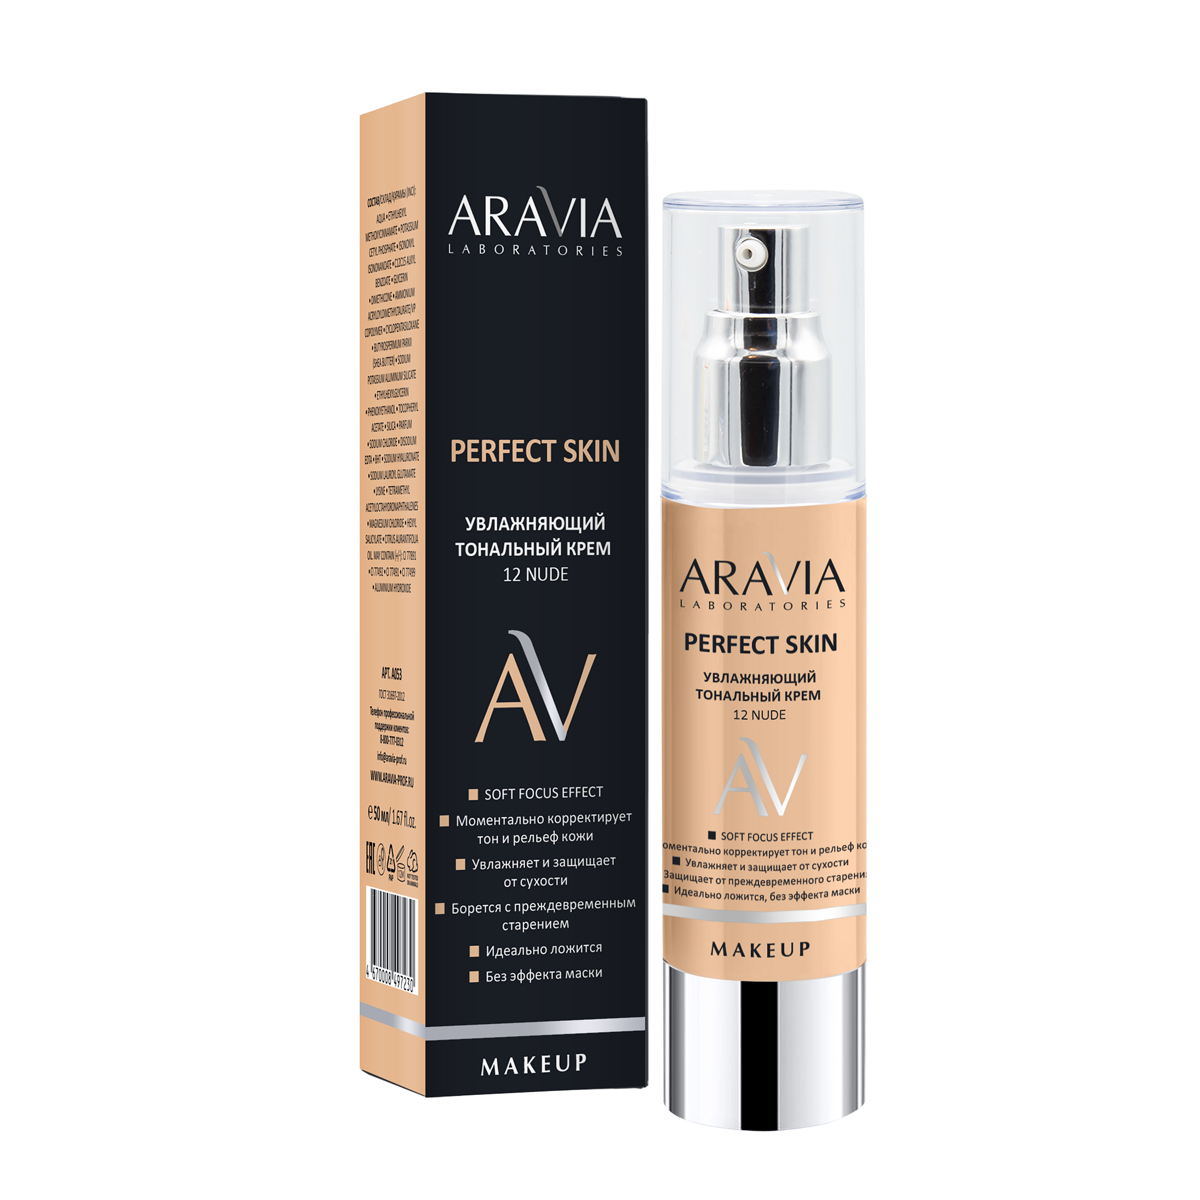 Aravia Laboratories Увлажняющий тональный крем Perfect Skin 12 Nude, 50 мл (Aravia Laboratories, Уход за лицом)